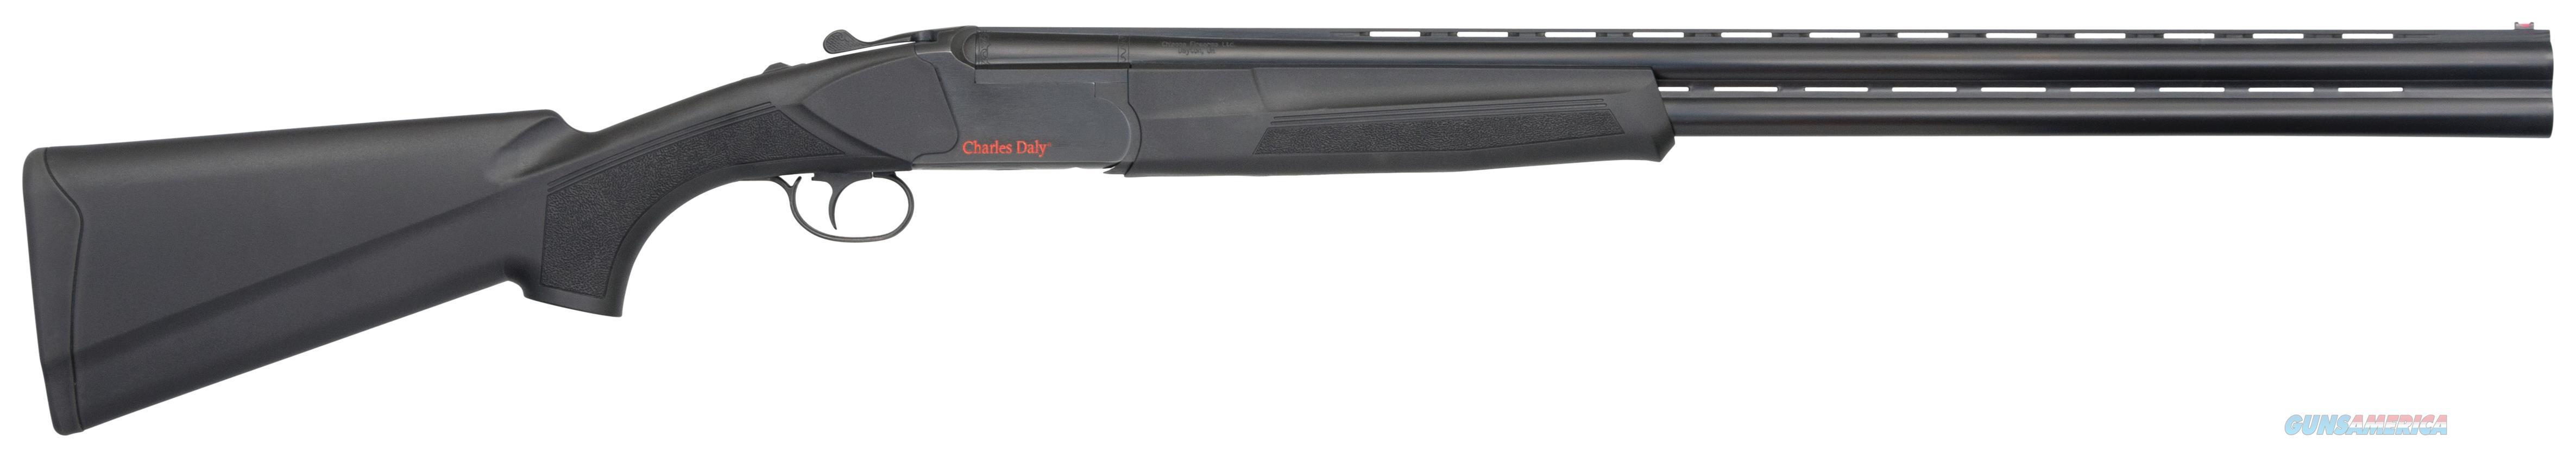 "Chiappa Firearms 202 20G 26"" 2Rd 930.132  Guns > Shotguns > C Misc Shotguns"